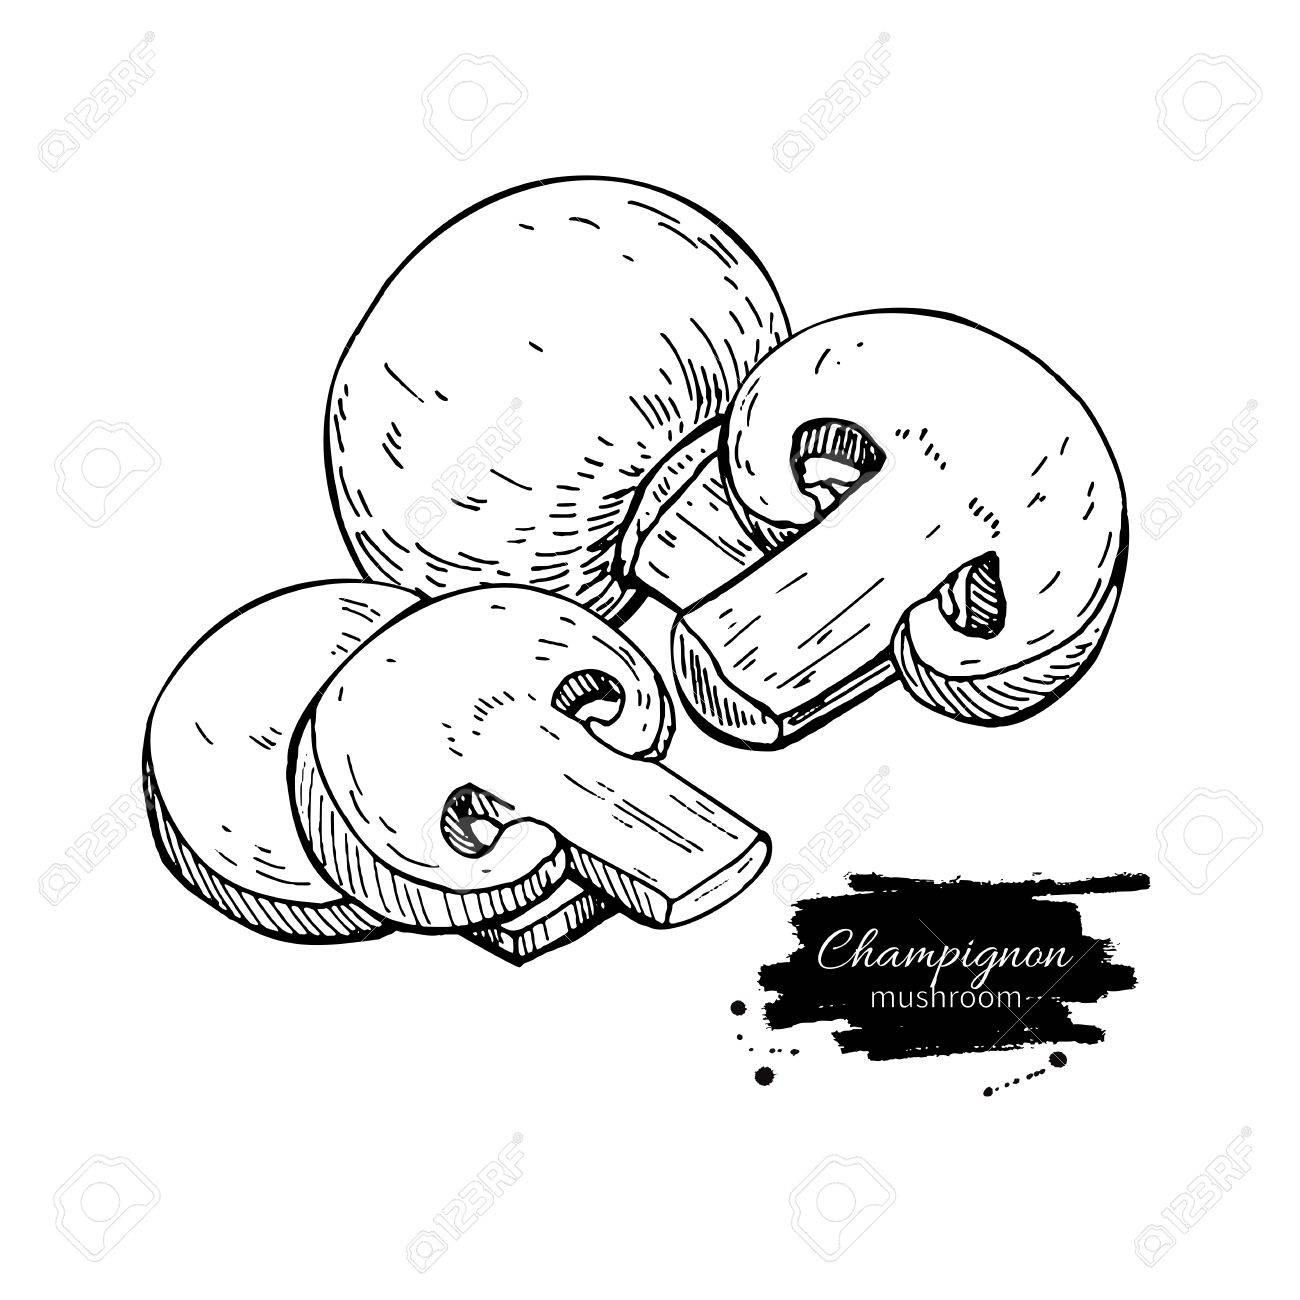 1300x1300 Champignon Mushroom Hand Drawn Vector Illustration. Sketch Food